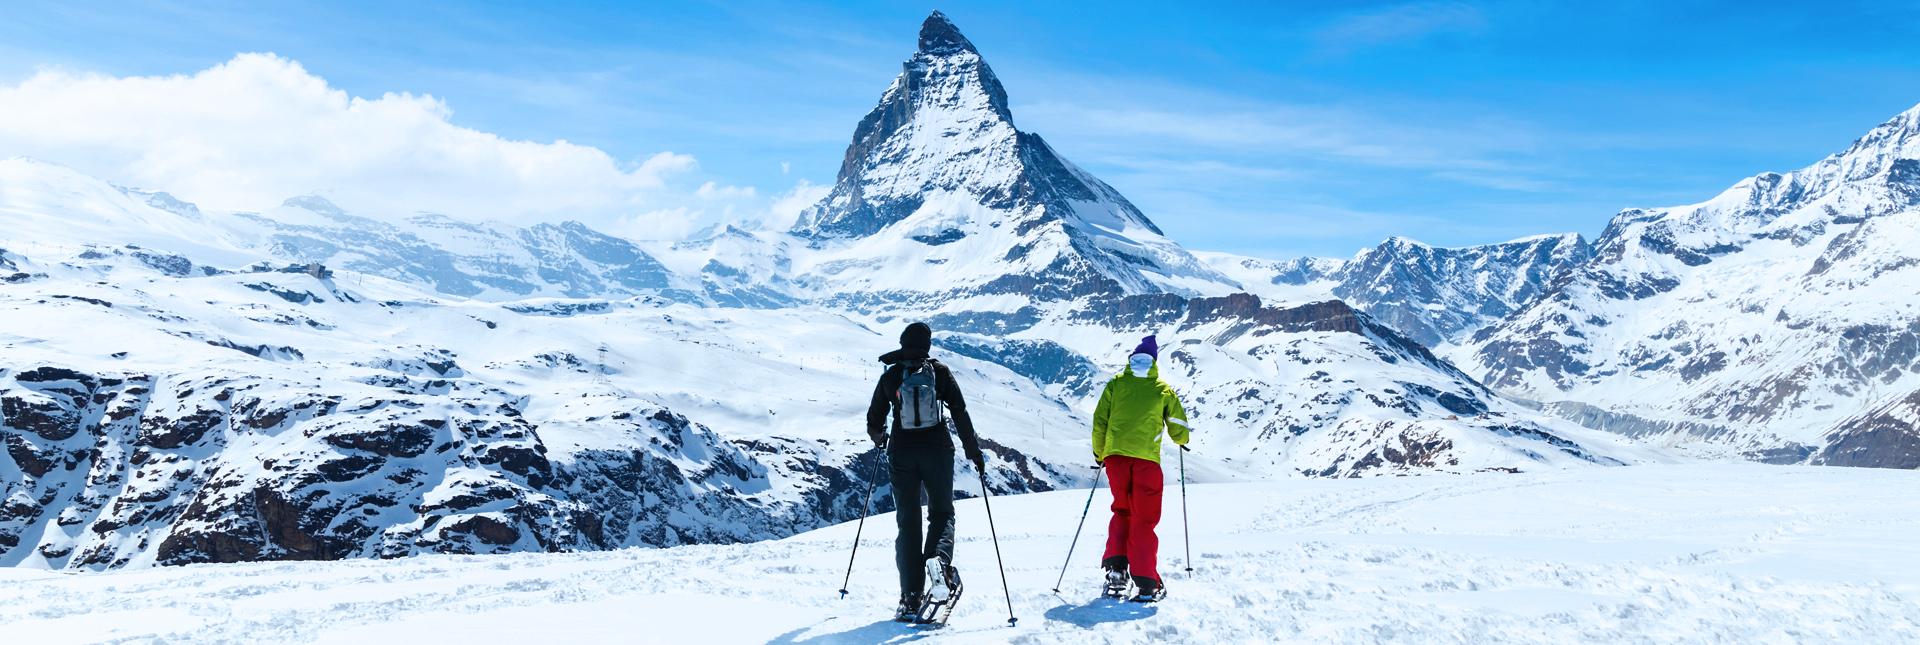 Snowshoeing in the Matterhorn trek